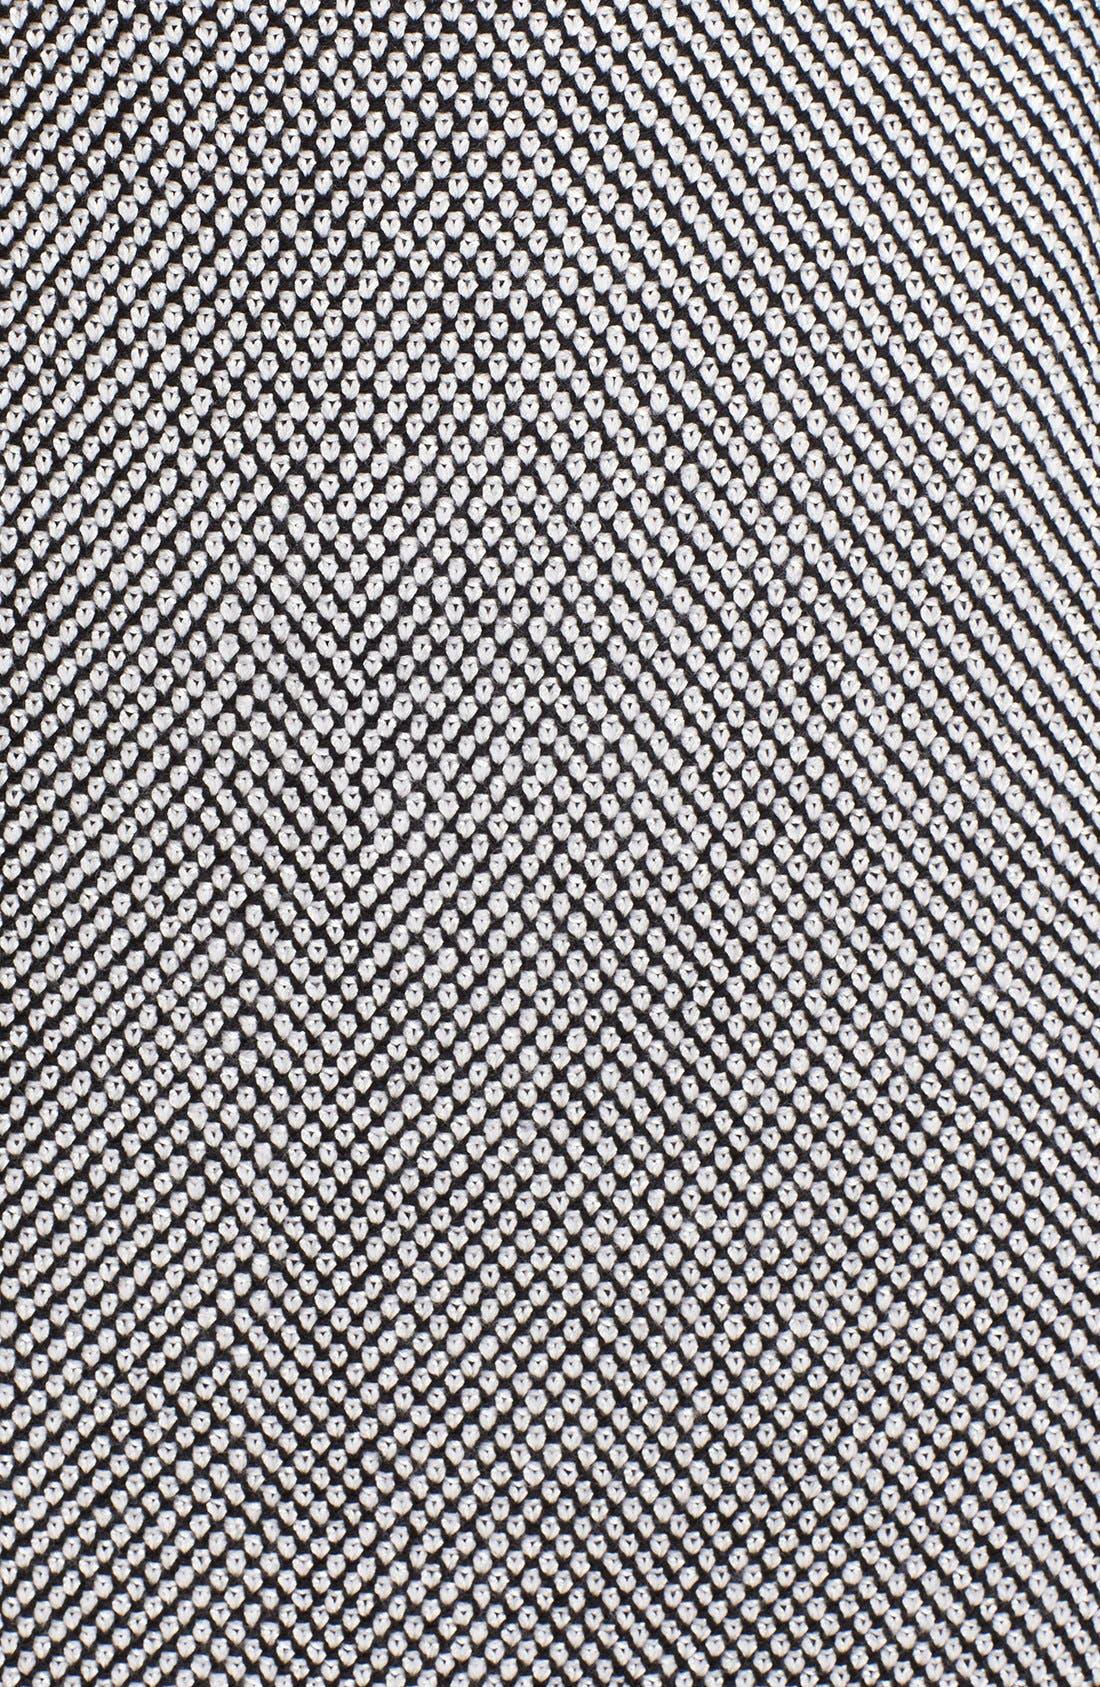 Alternate Image 5  - St. John Collection Bird's Eye Tweed & Crepe Marocain Skirt